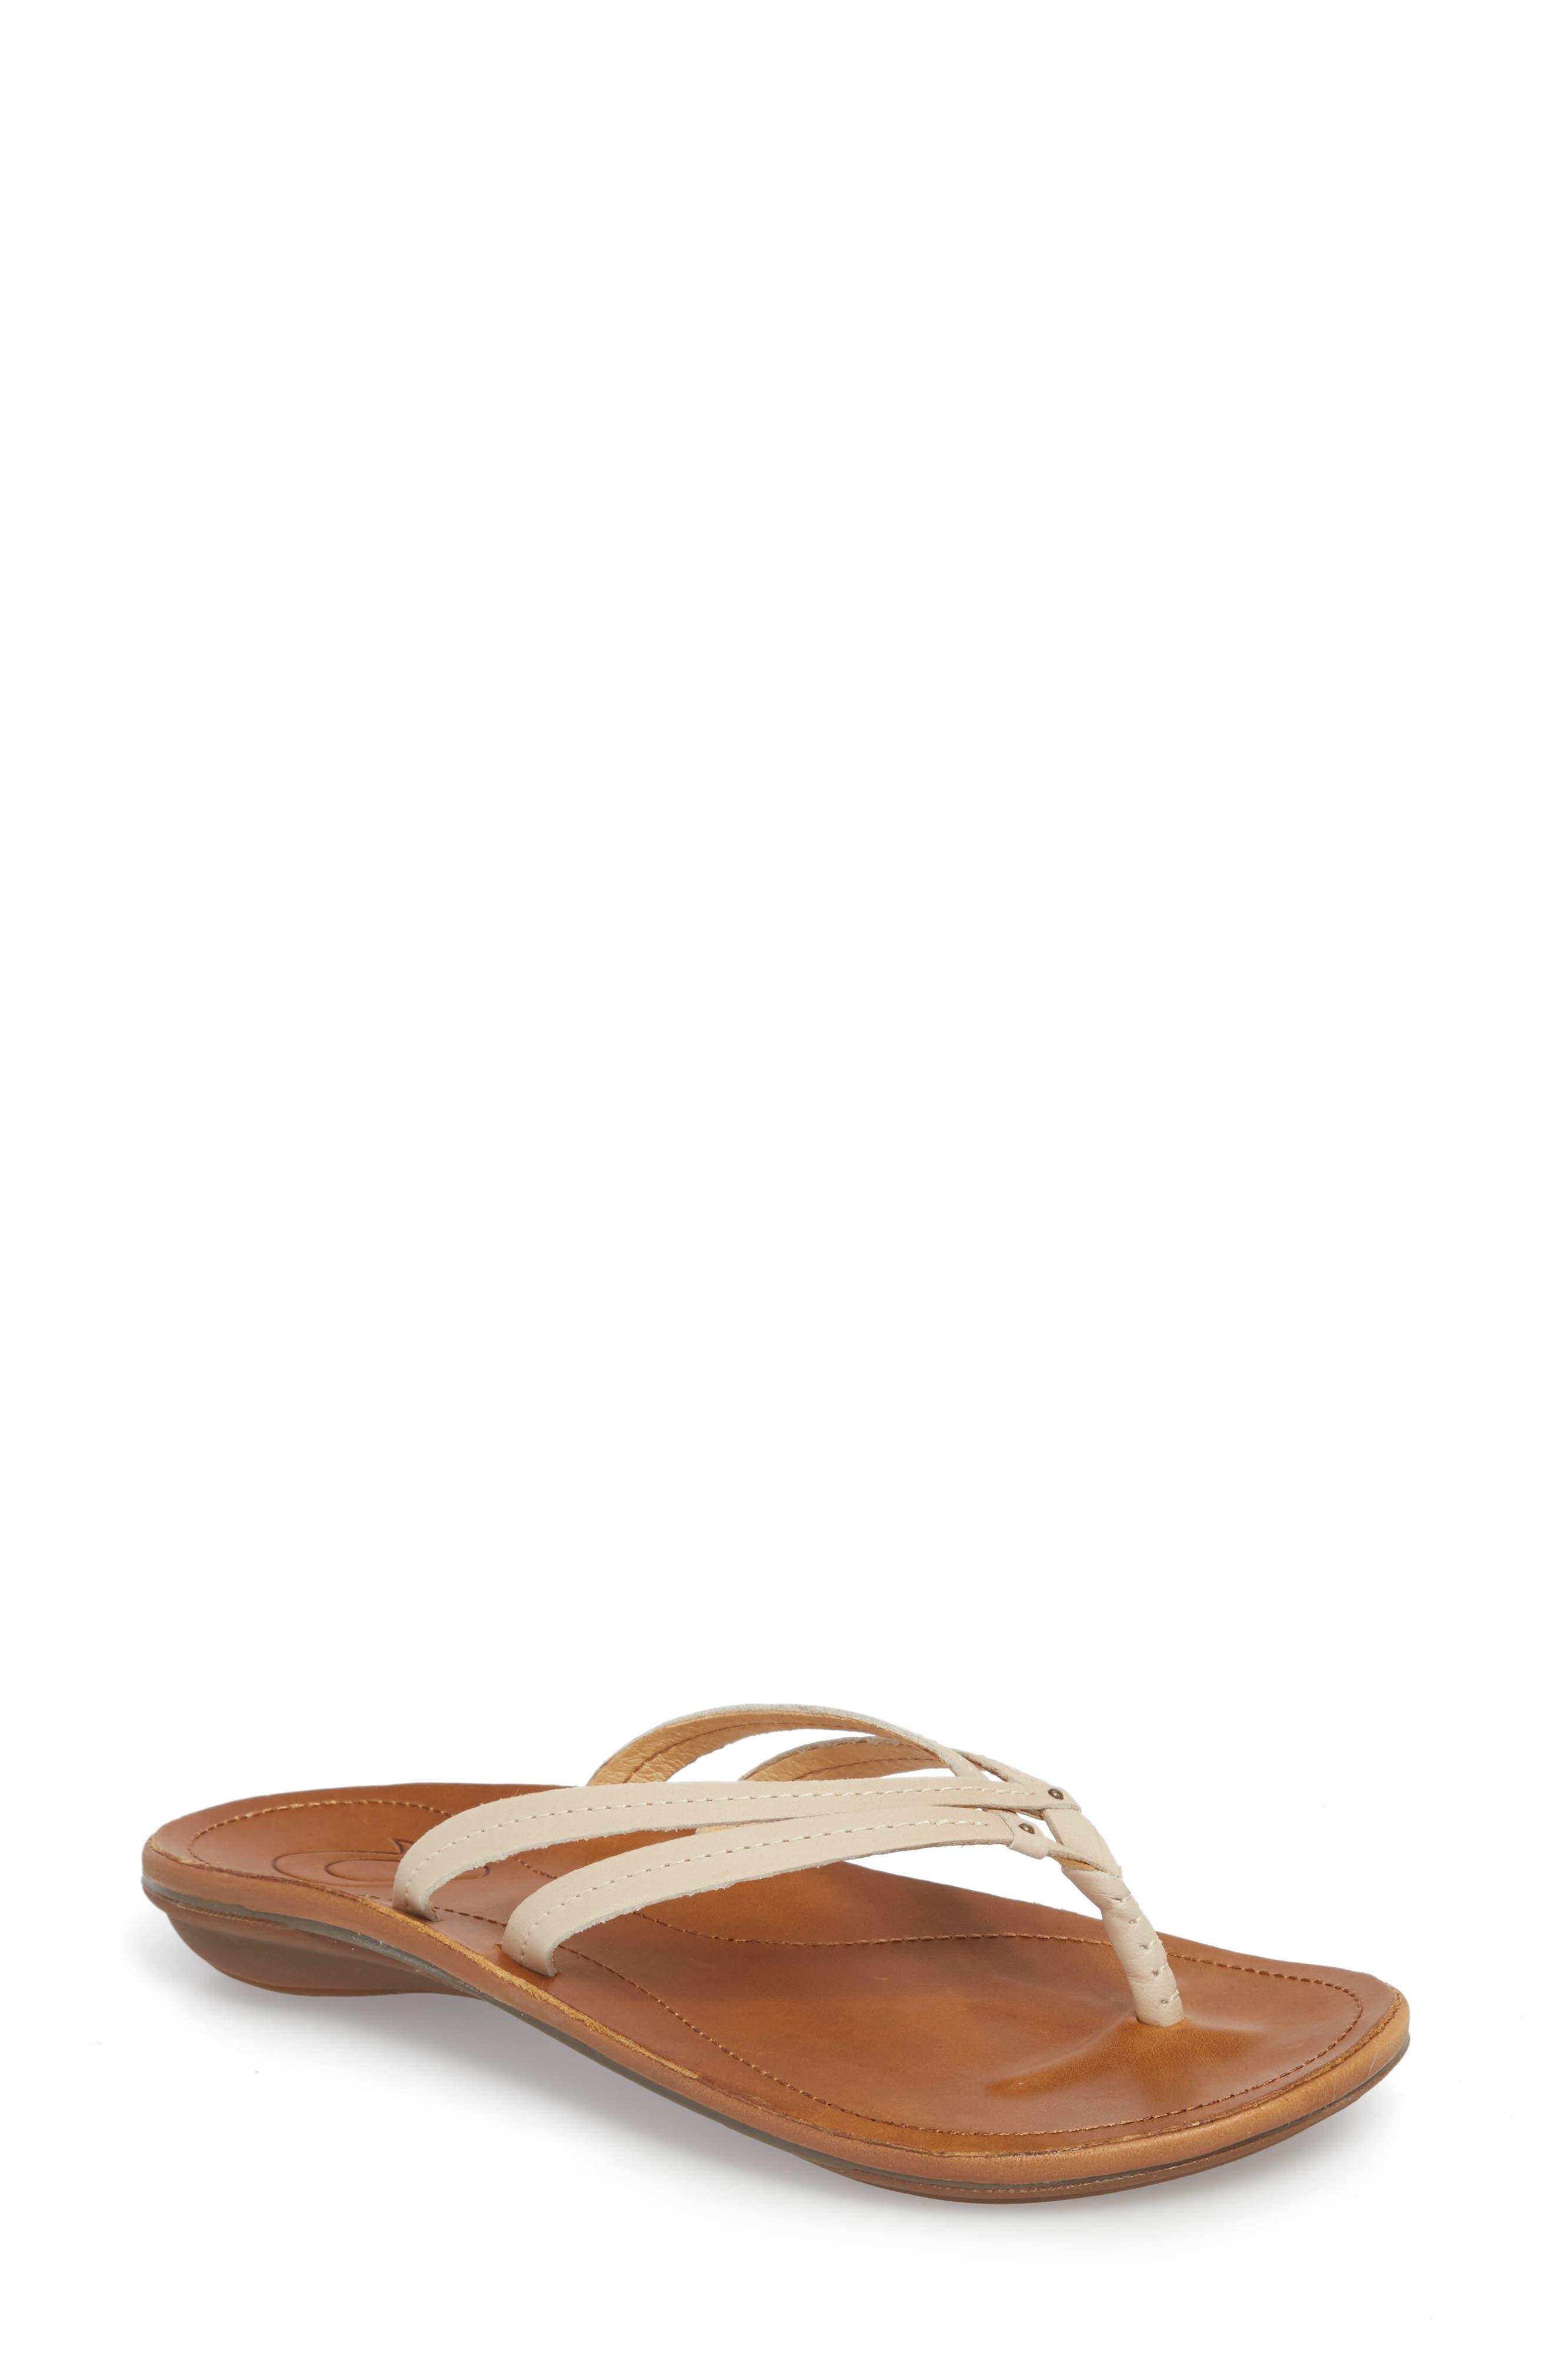 'U'i' Thong Sandal,                         Main,                         color, TAPA/ SAHARA LEATHER